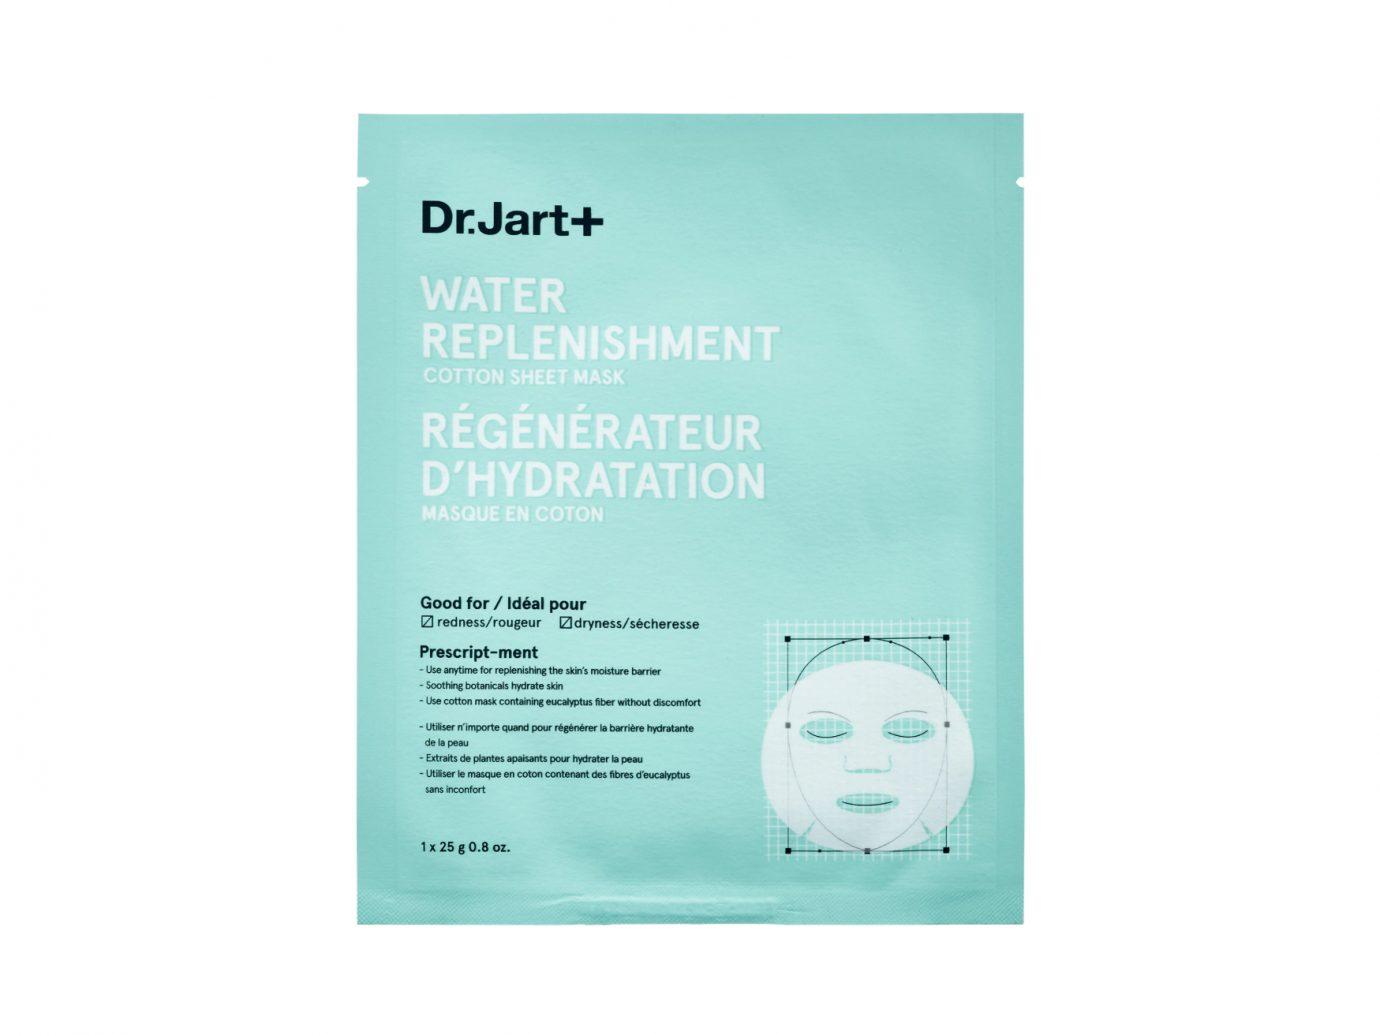 Dr. Jart+ Water Replenishment Cotton Sheet Mask